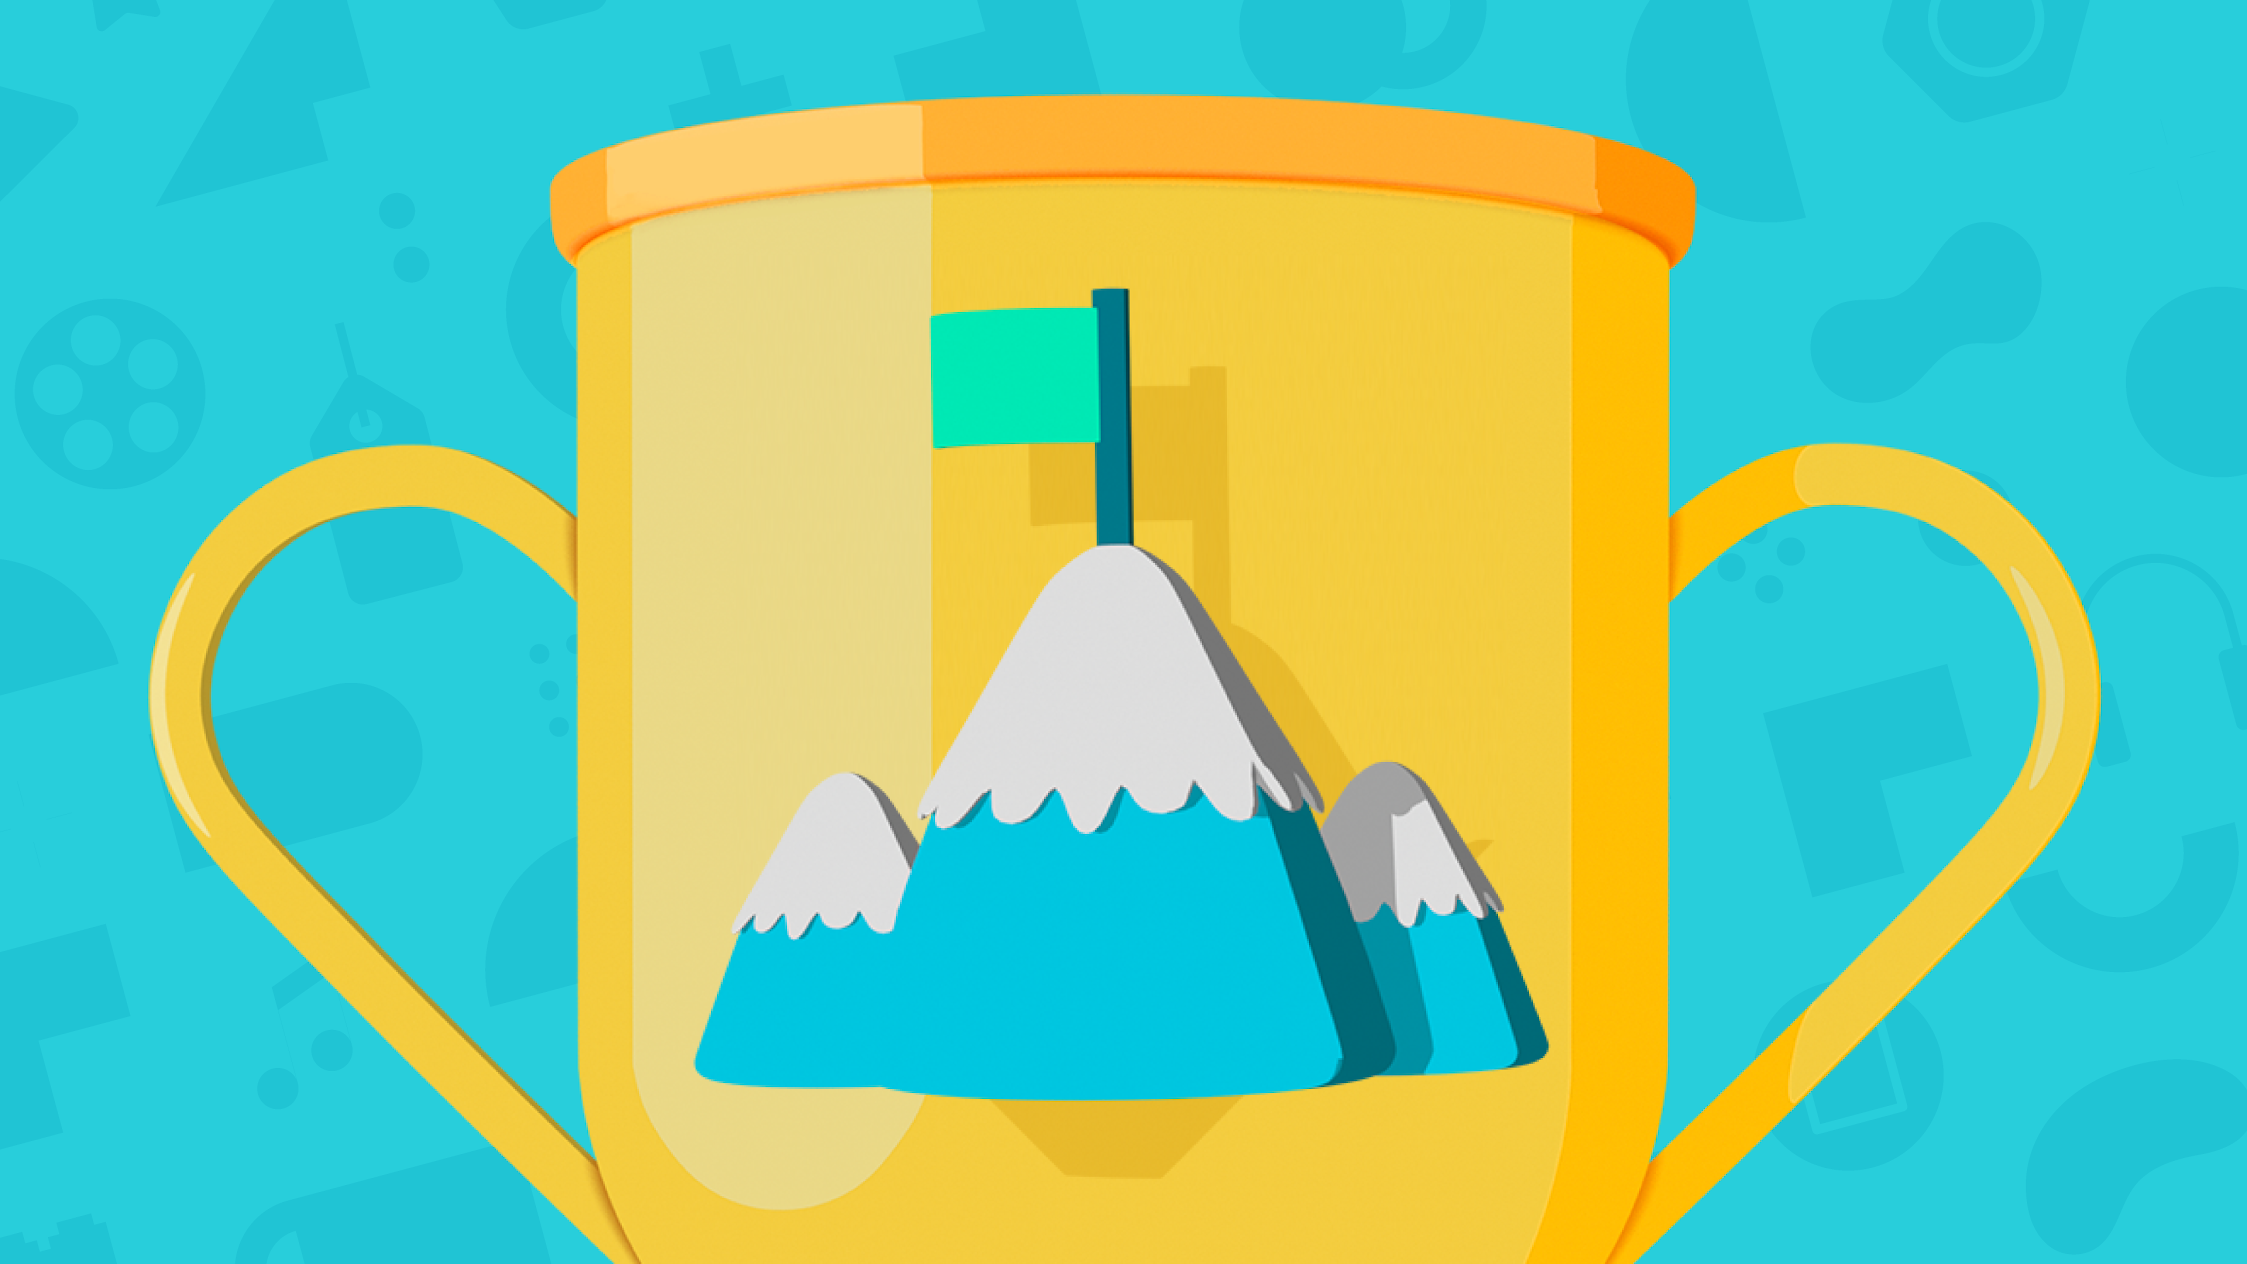 Best Self-Improvement Apps of 2018